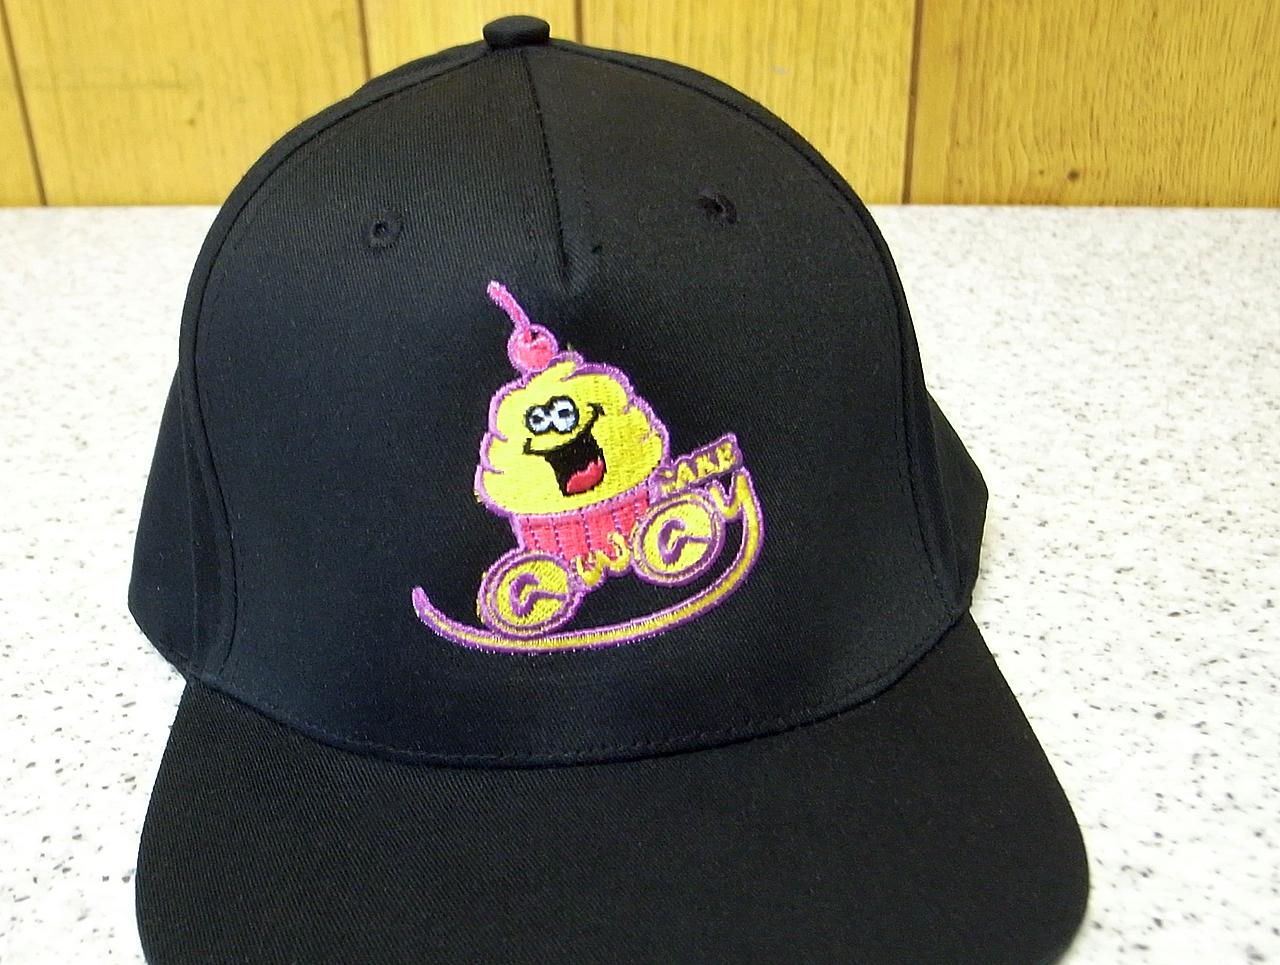 Cake-cap.jpg